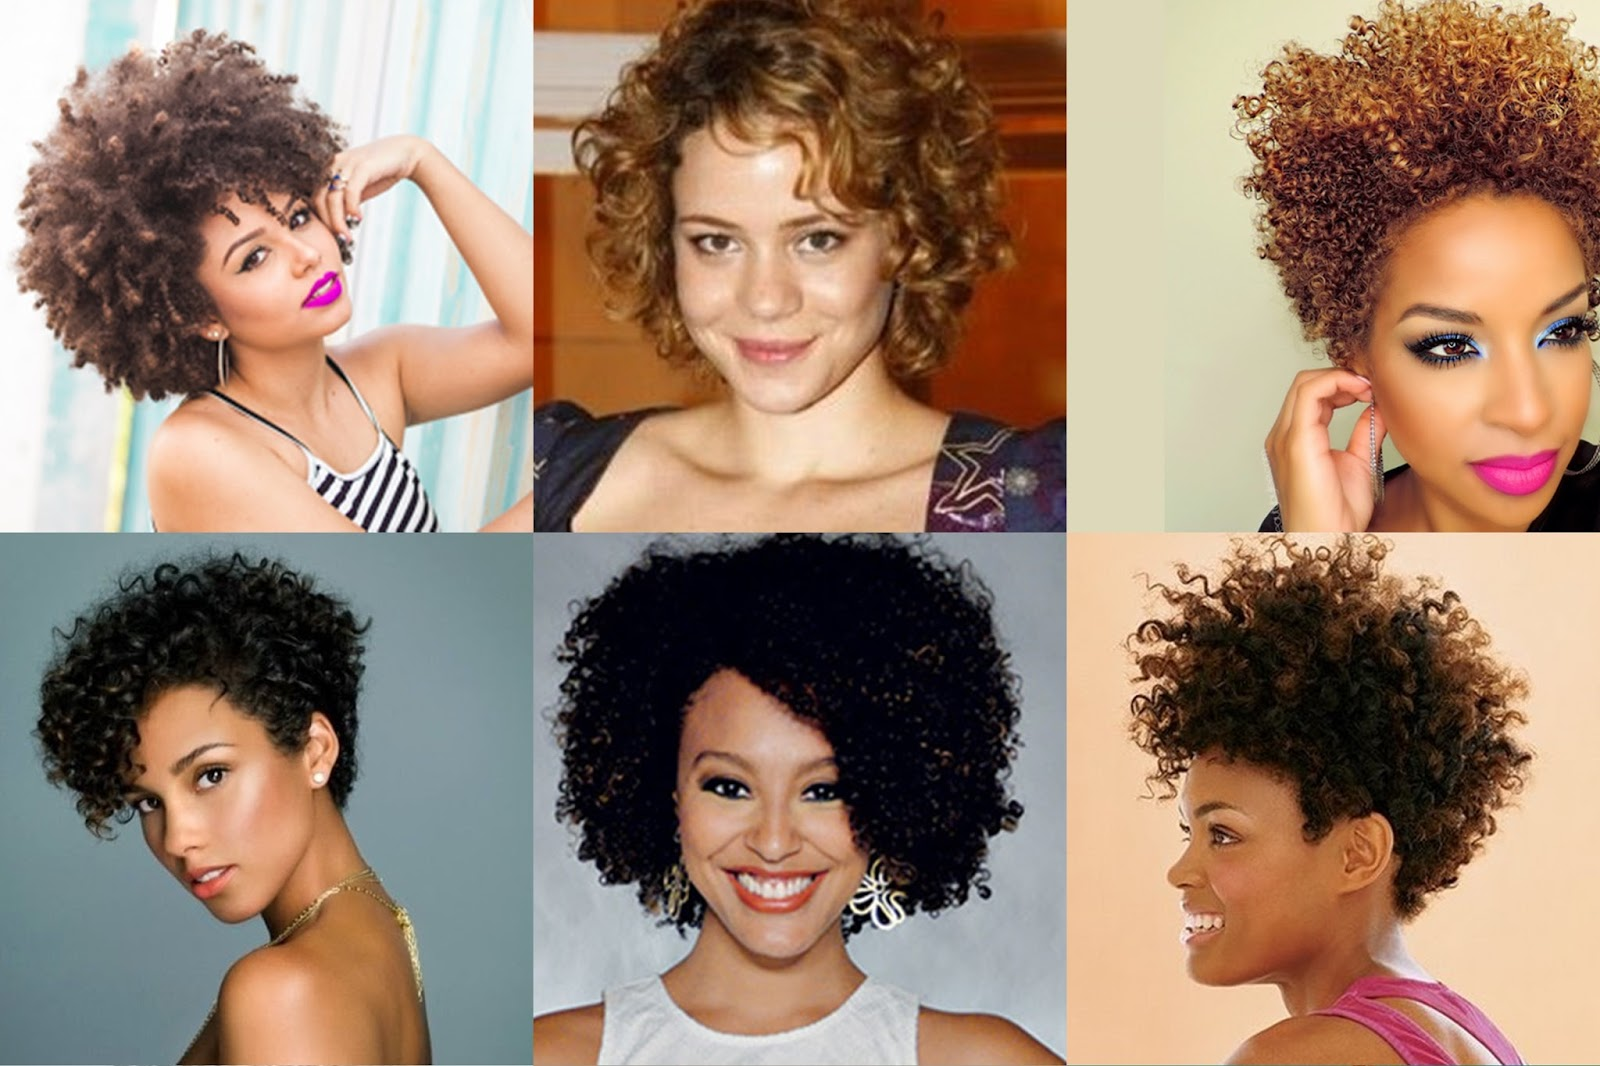 cabelo cacheado curto, cabelo curto cacheado, corte curto para cabelo cacheado, como cortar o cabelo curto cacheado, cachos curtos, kahchear, blog kahena kévya, kahena kévya, blog closet de esmaltes, closet de esmaltes, cabelo cacheado,